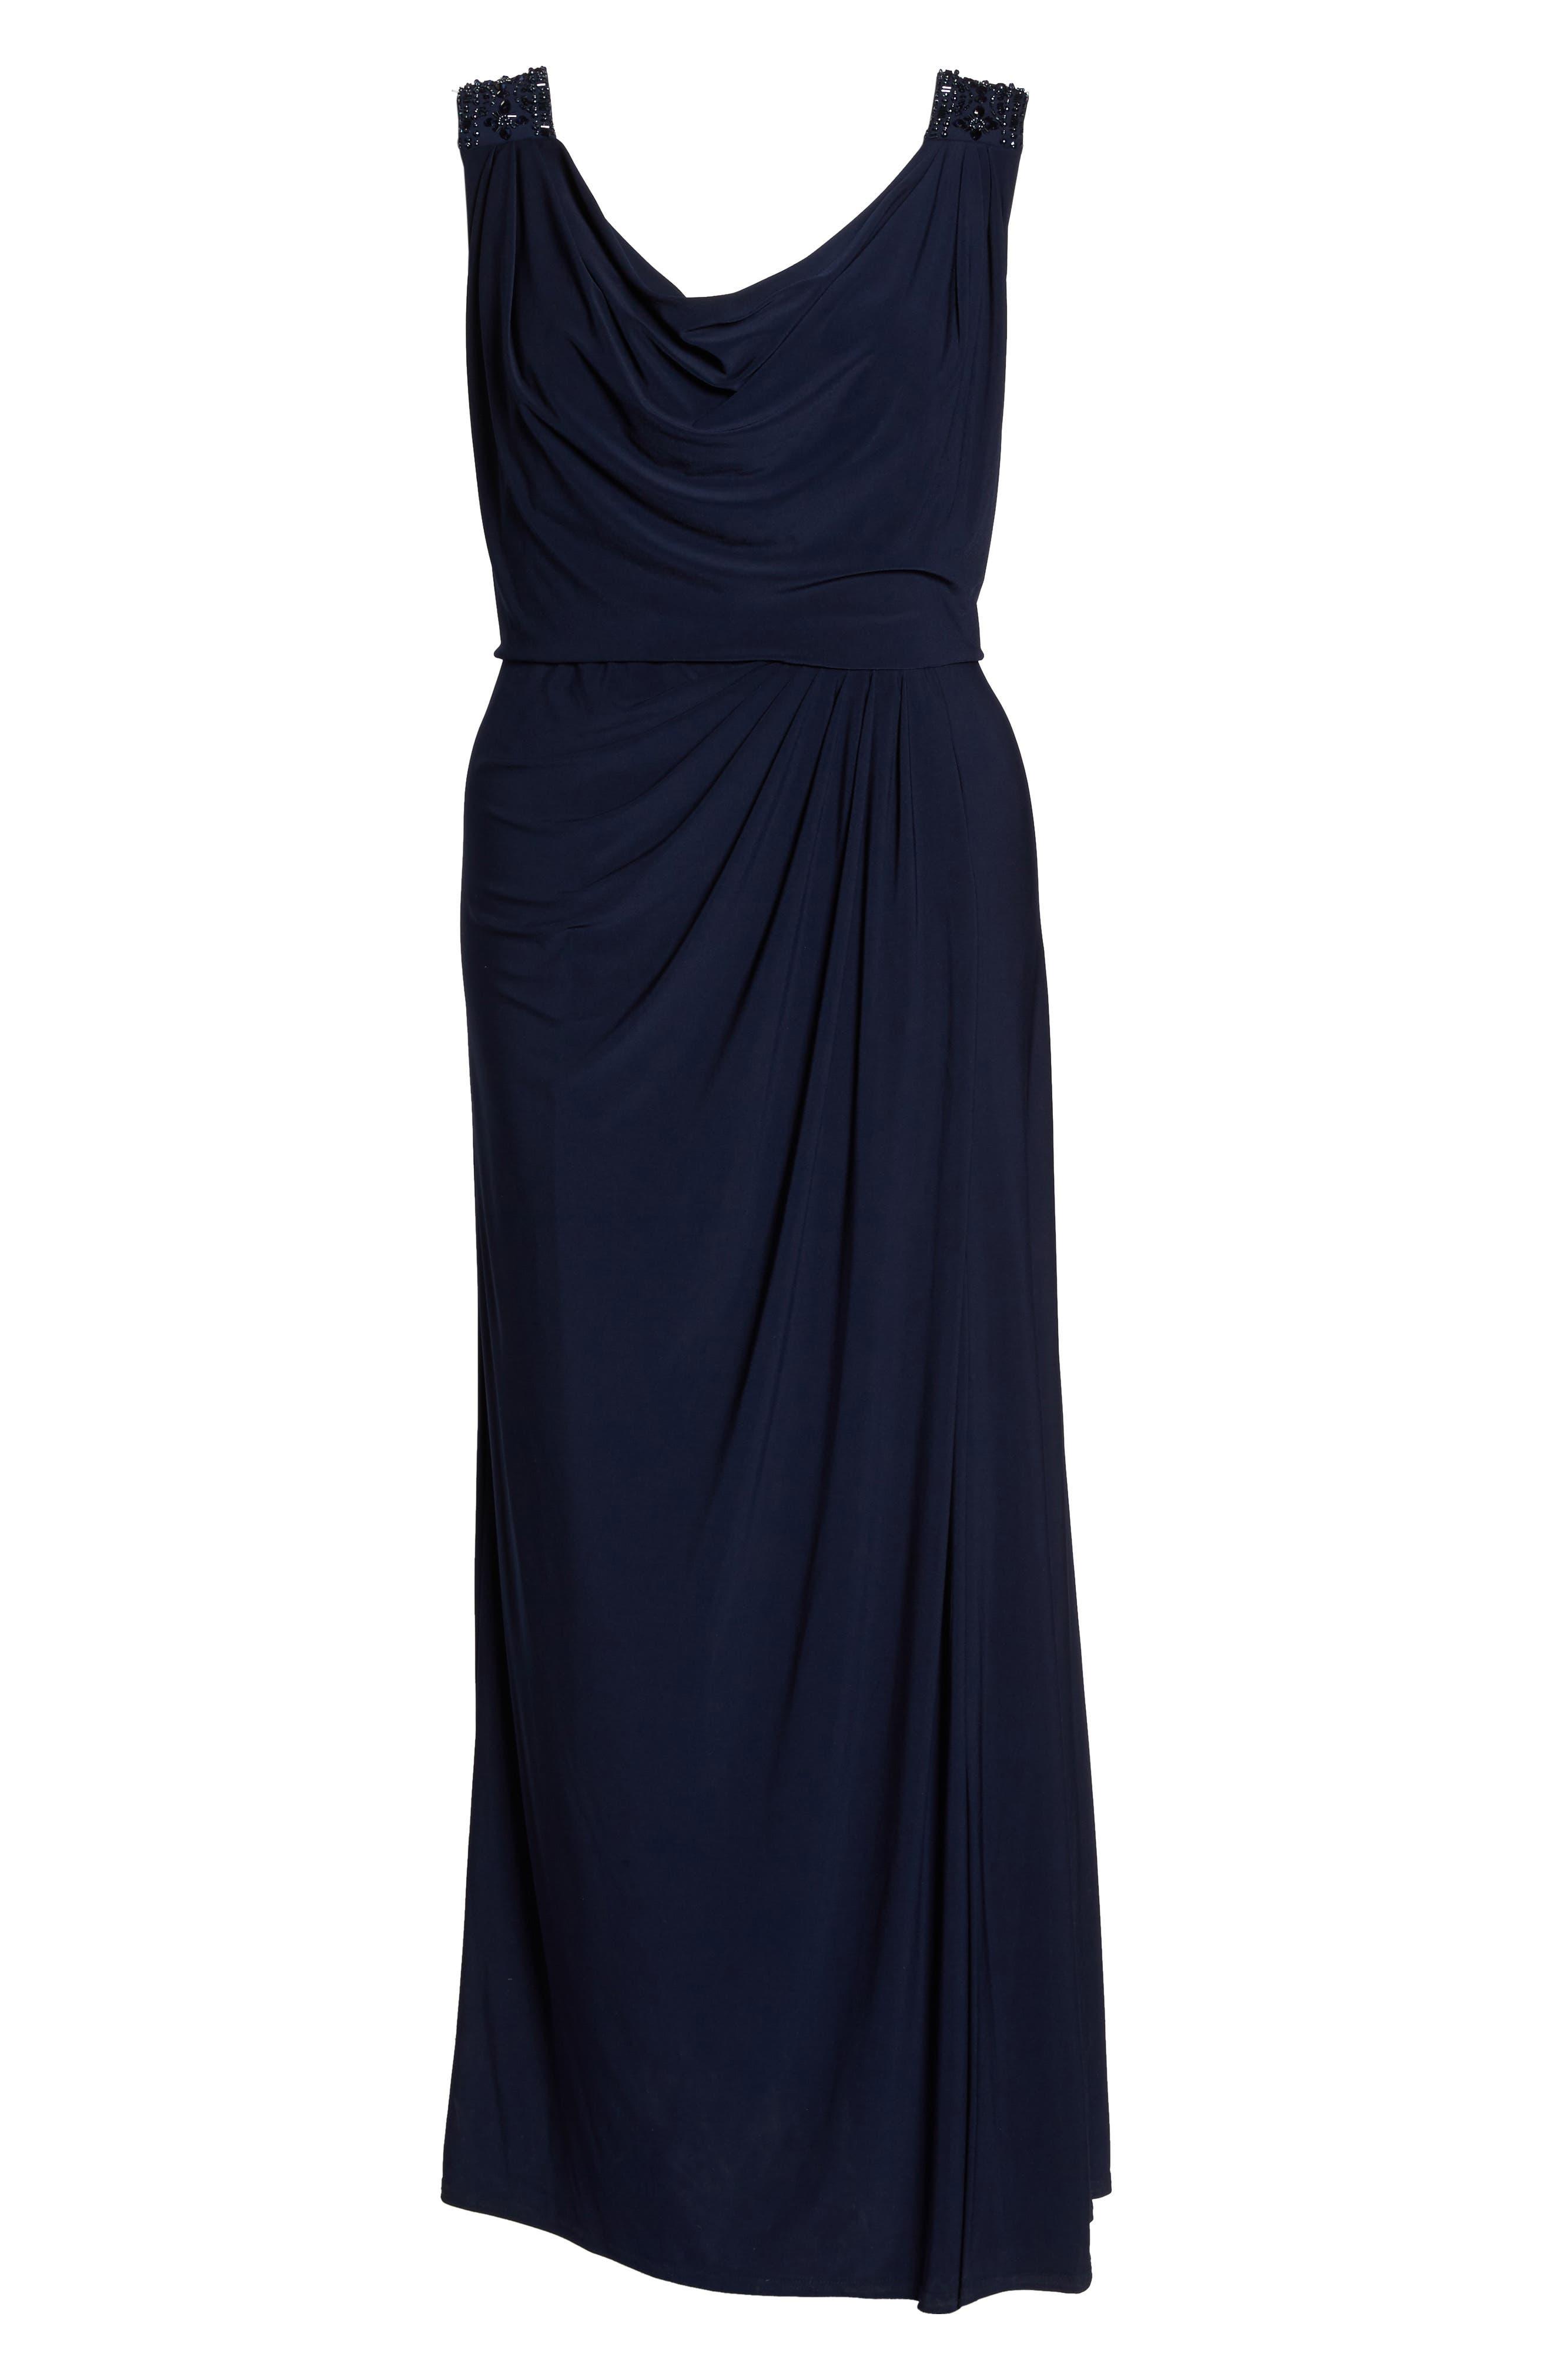 Cowl Neck A-Line Dress,                             Alternate thumbnail 6, color,                             Navy